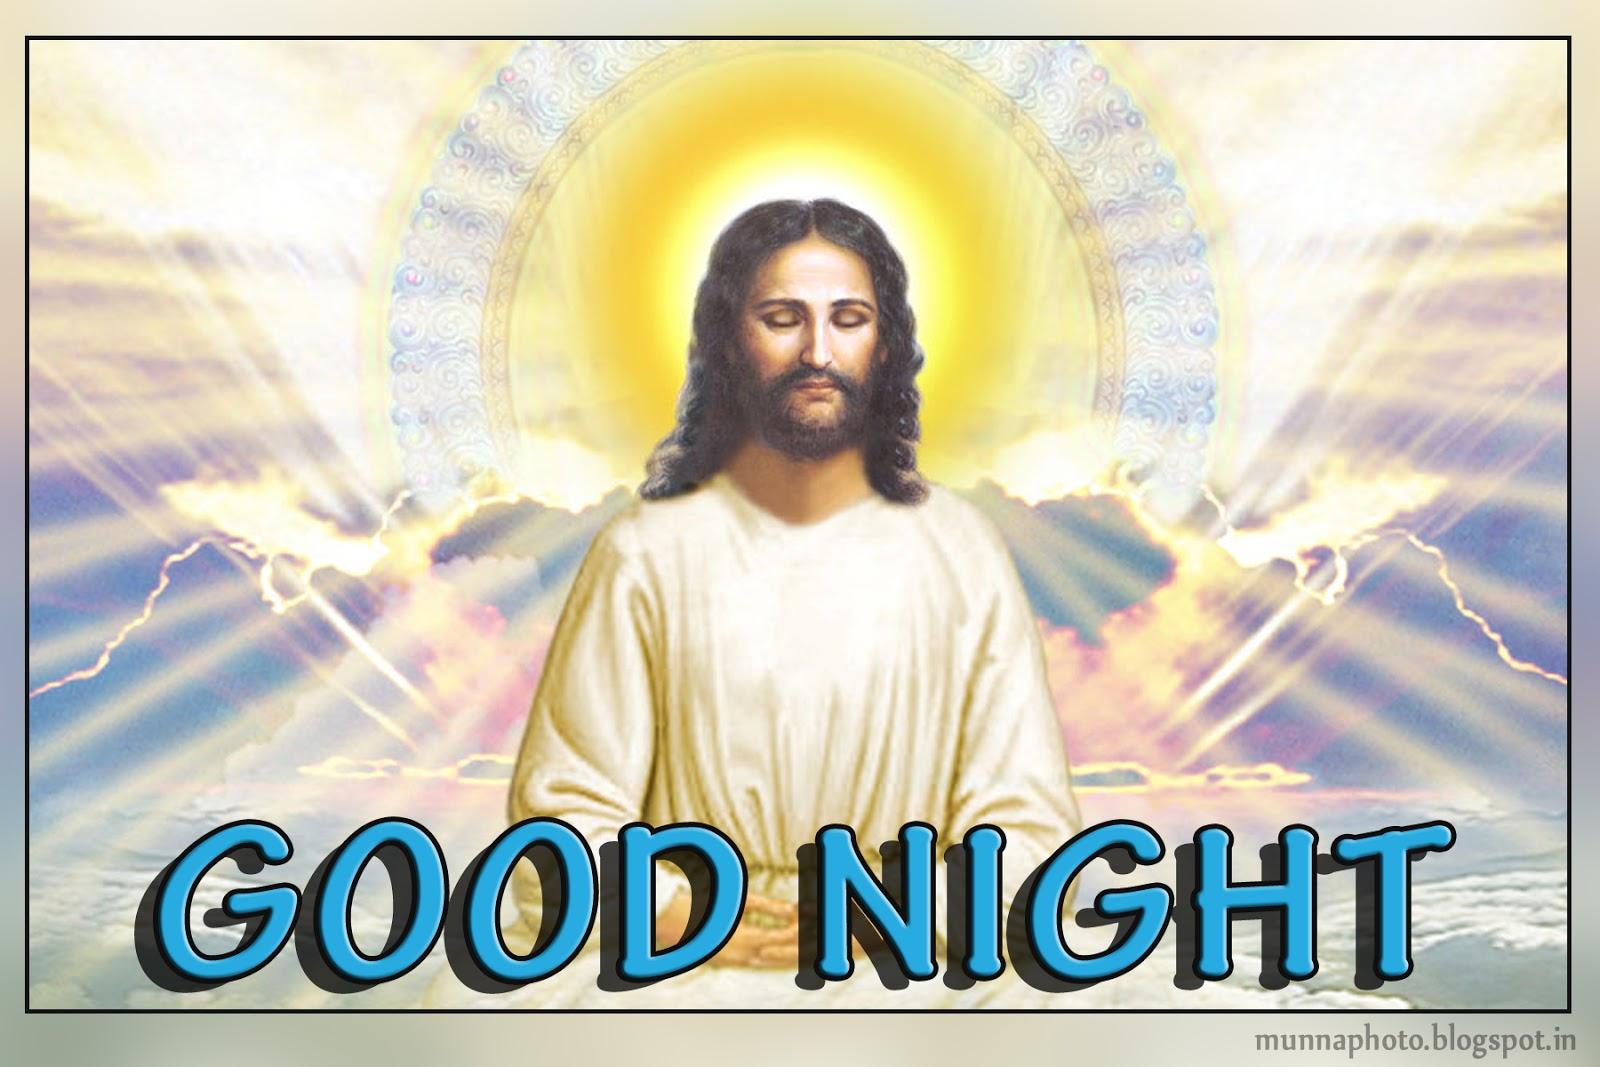 Simple Wallpaper Night God - God-jesus%2Bgood%2Bevning%2Bwallpaper1  Graphic-24970.jpg